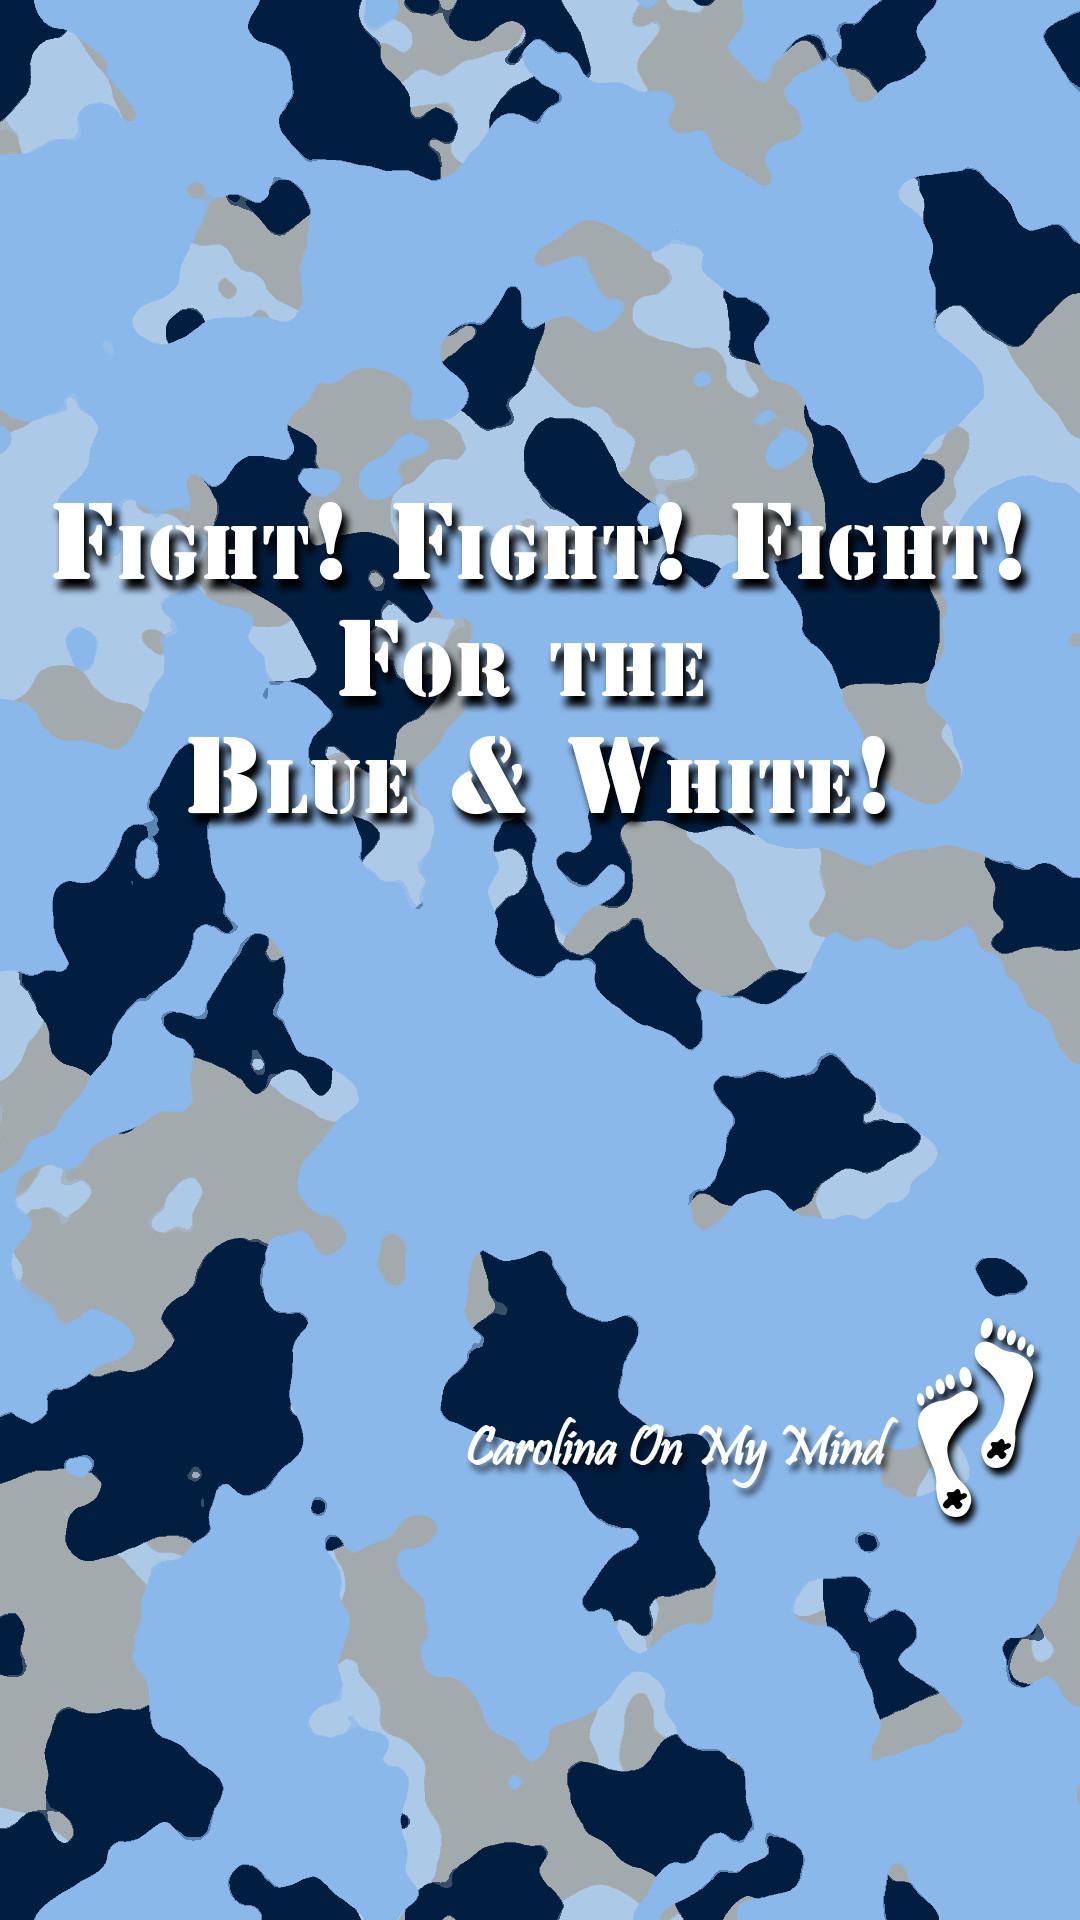 Fight Fight Fight on Camo UNC Smartphone Wallpaper 1080 x 1920